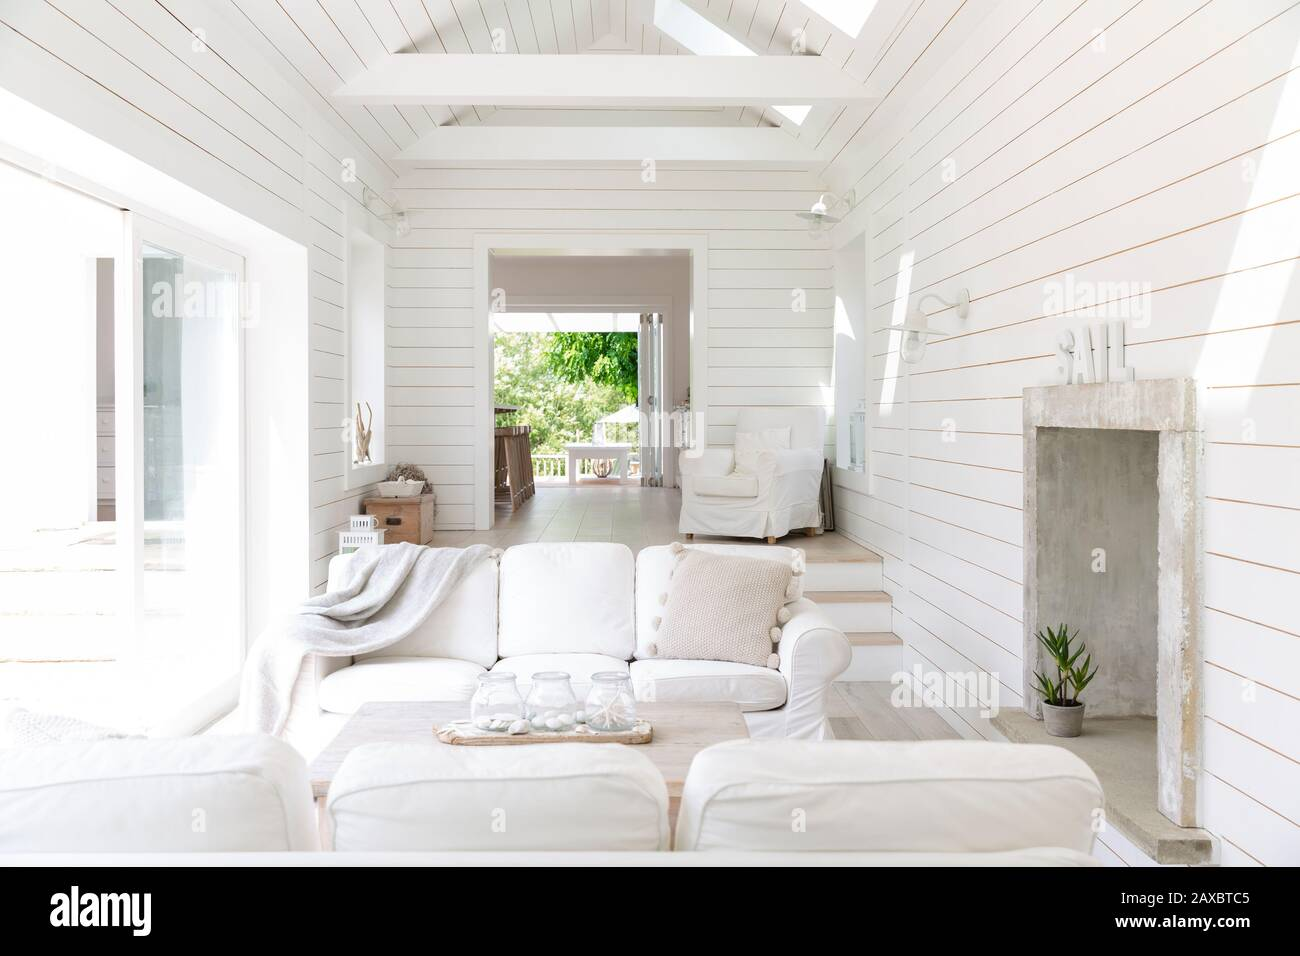 White wood shiplap home showcase beach house living room Stock Photo